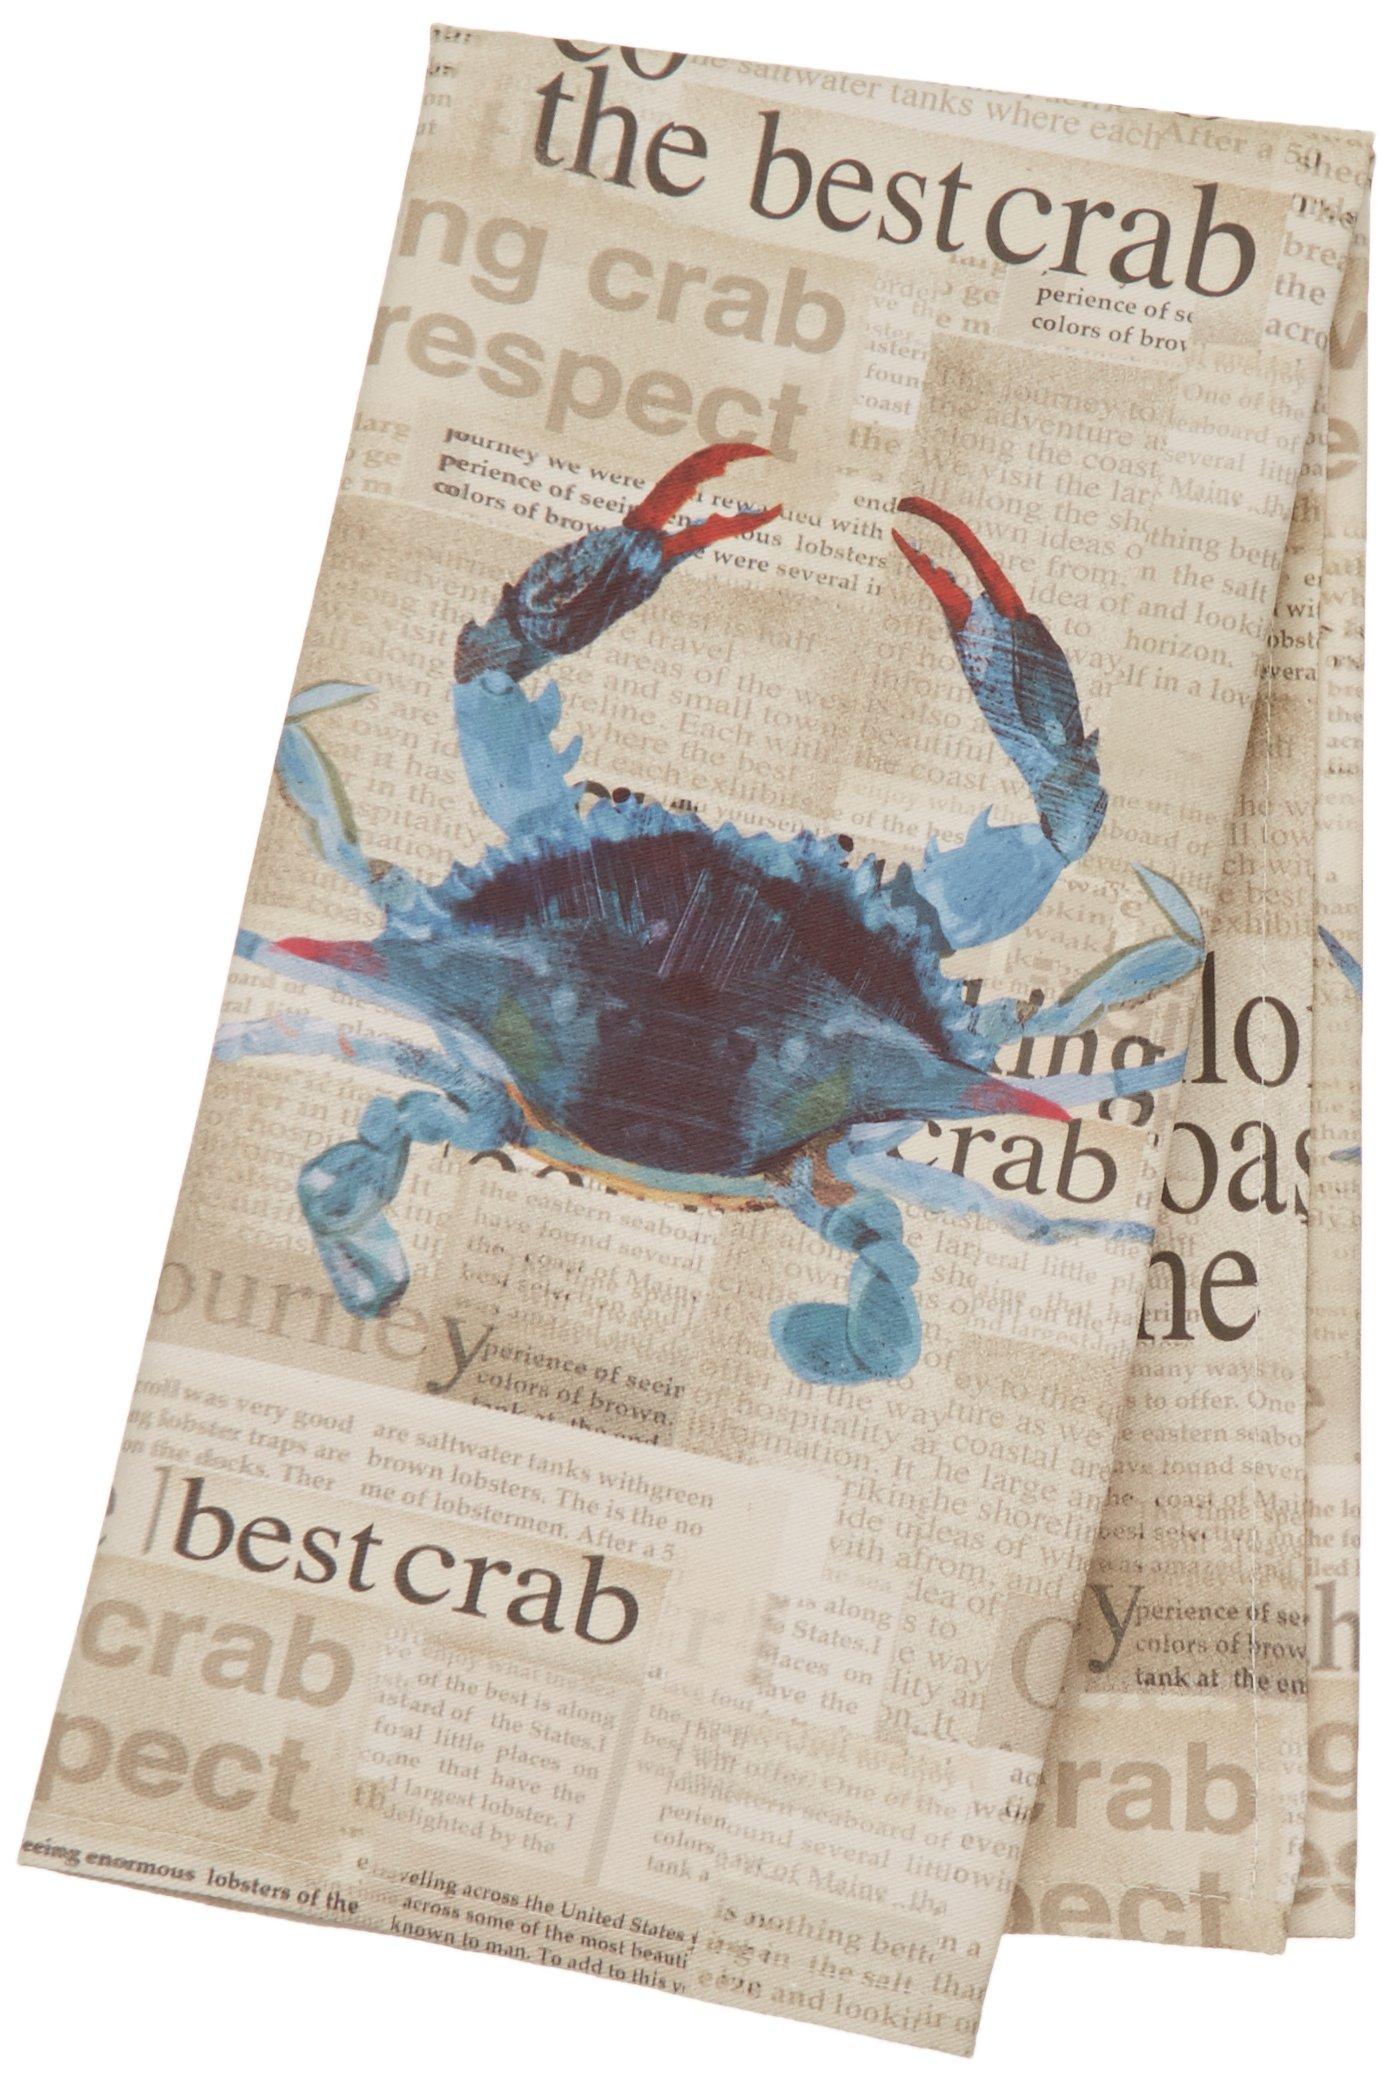 Paperproducts Design Kitchen Towel Featuring Best Crab Design, Blue